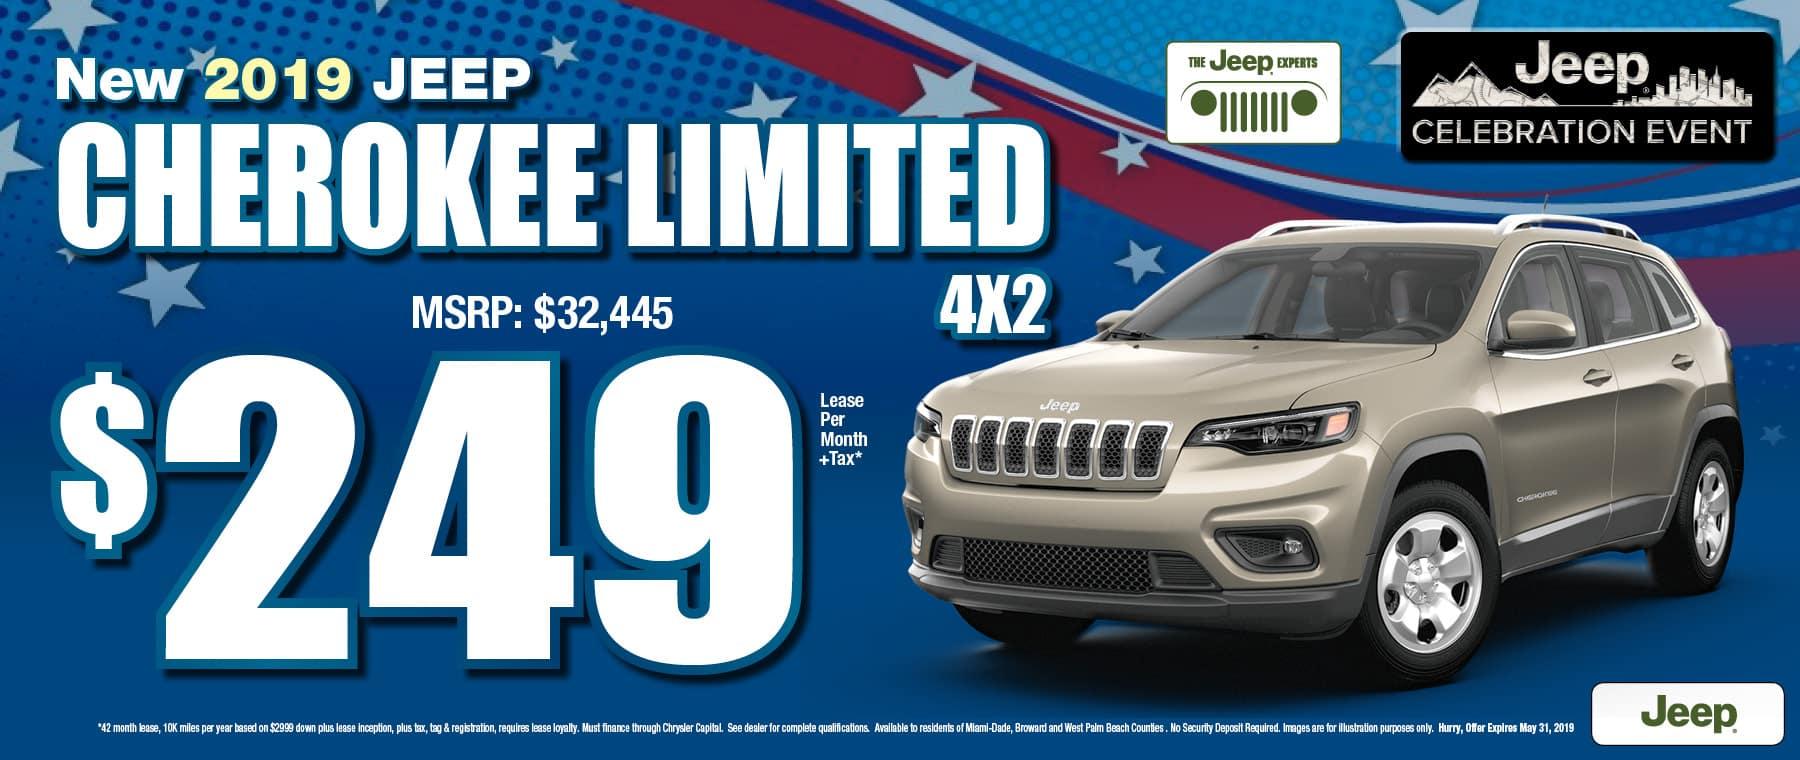 Cherokee $240 Lease